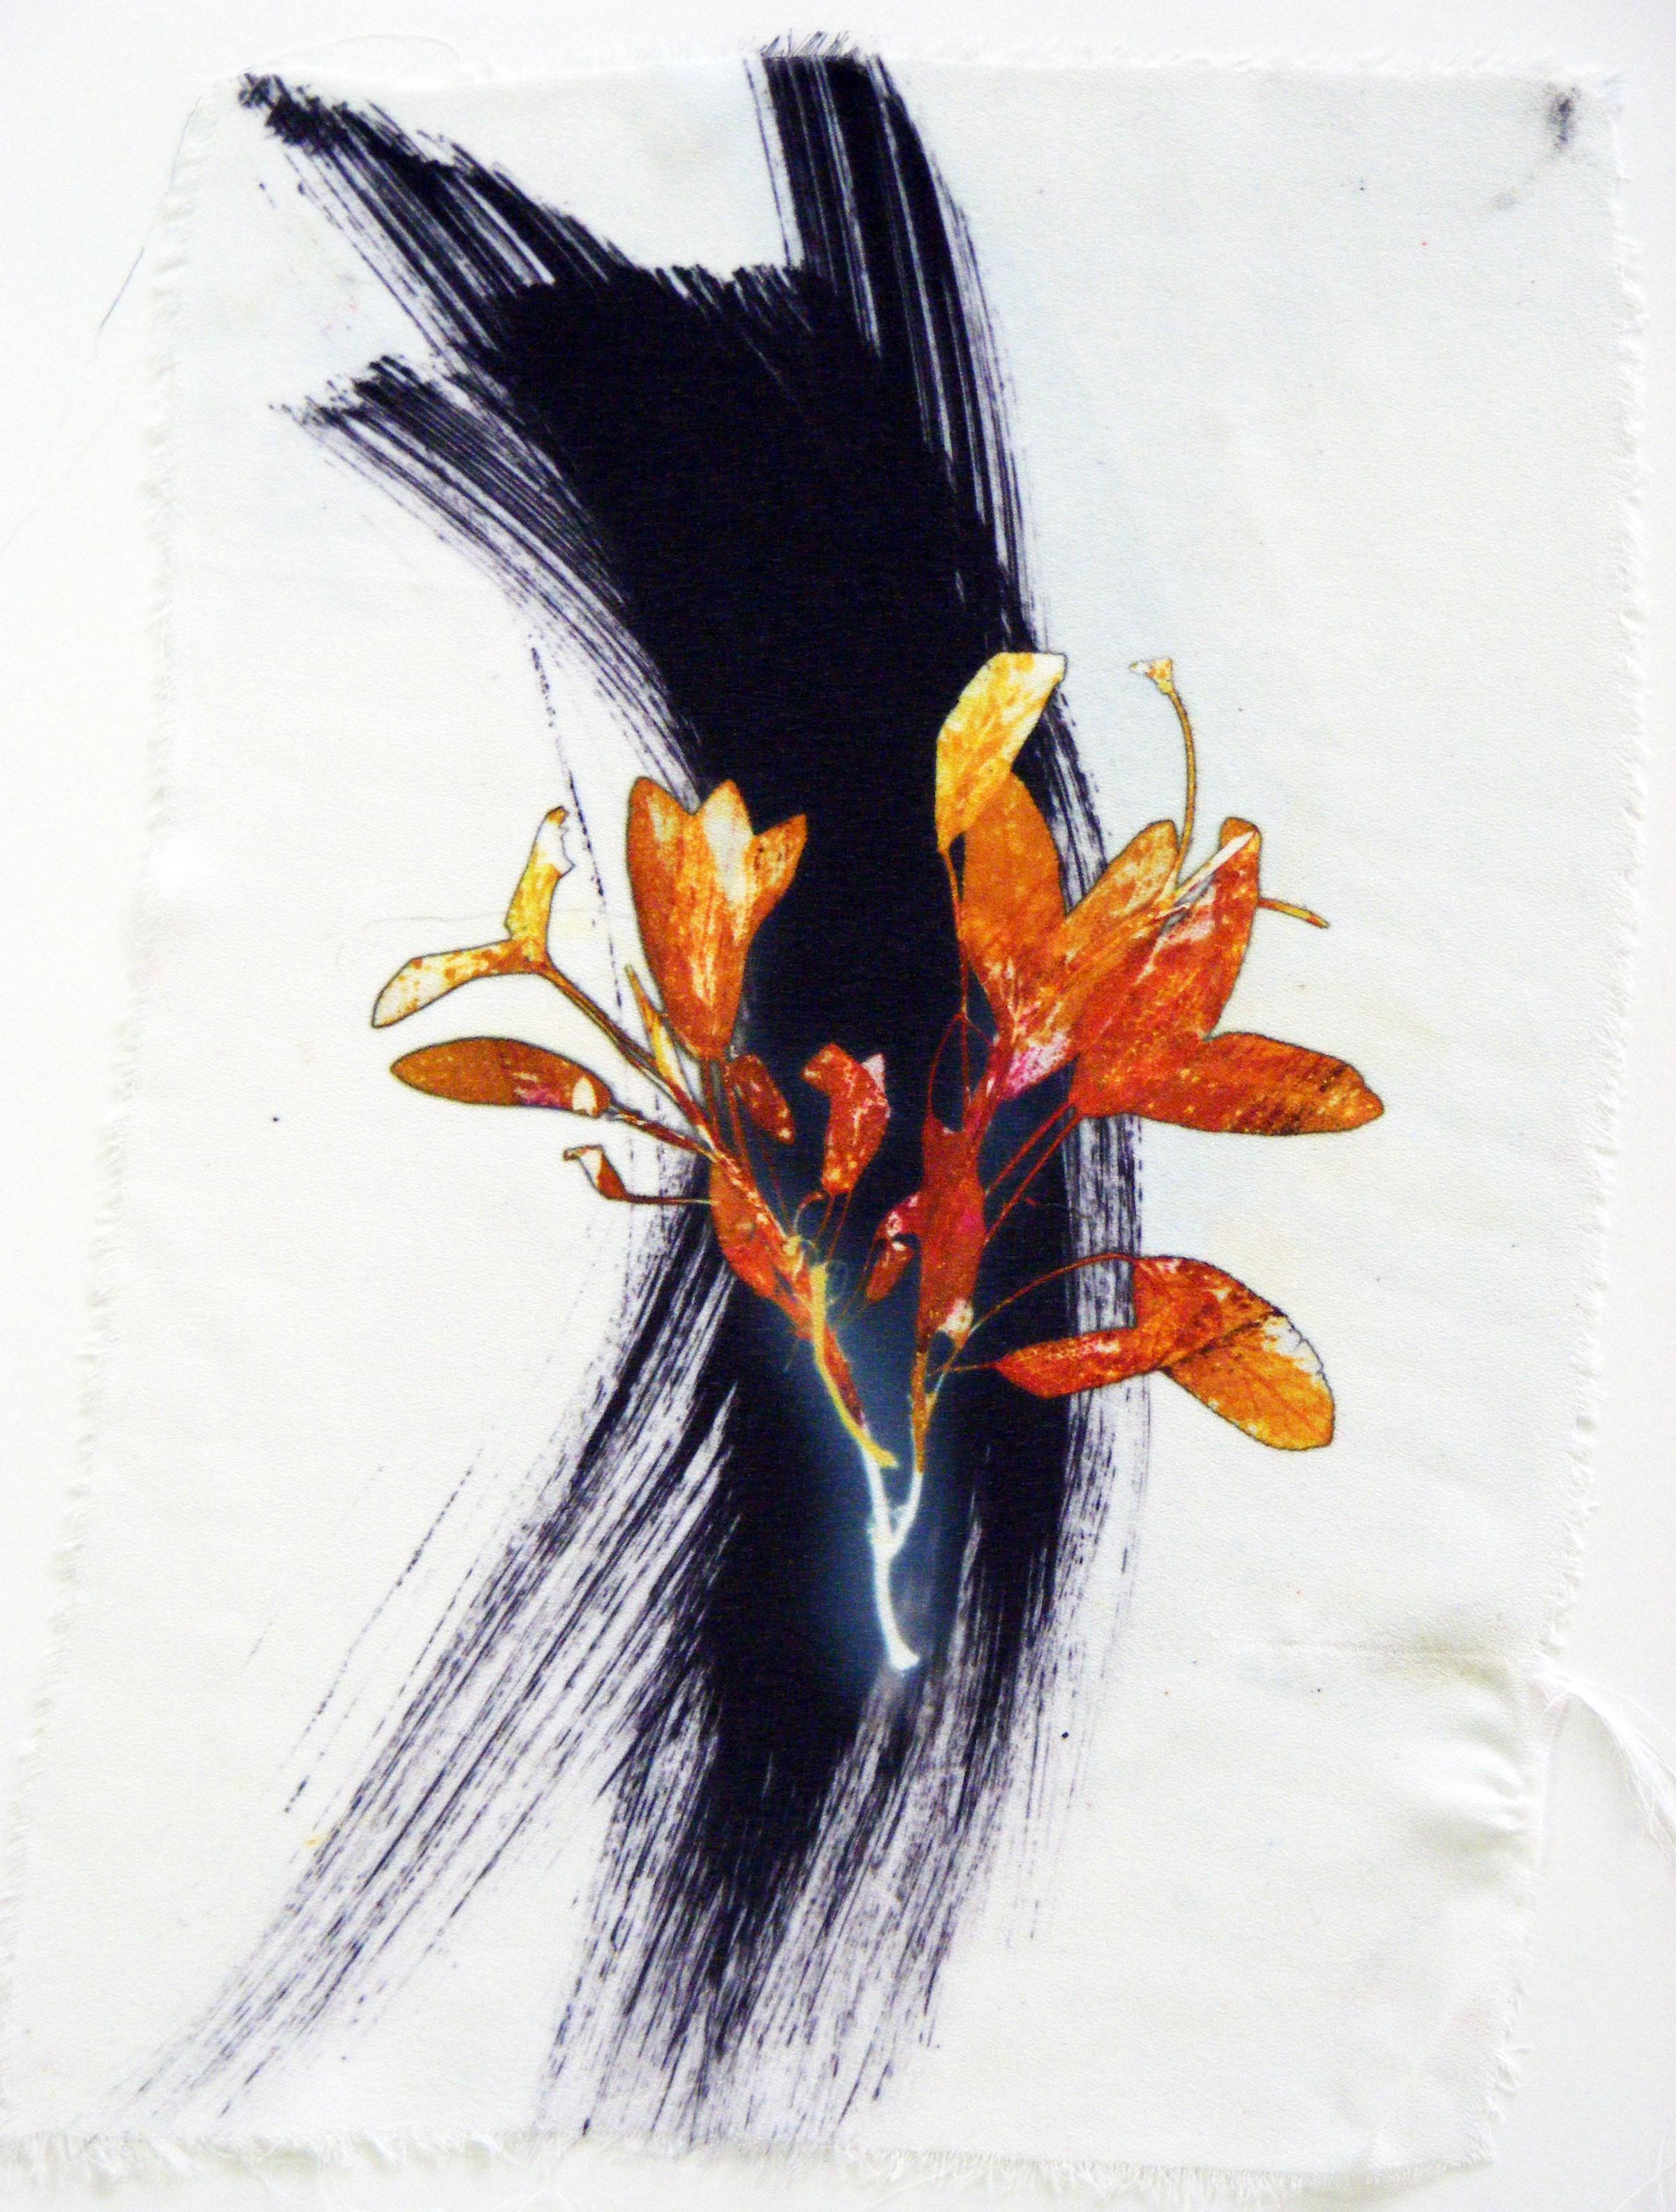 Herb 6 | 20cm x 28cm Photographic Print/ Paint on Silk